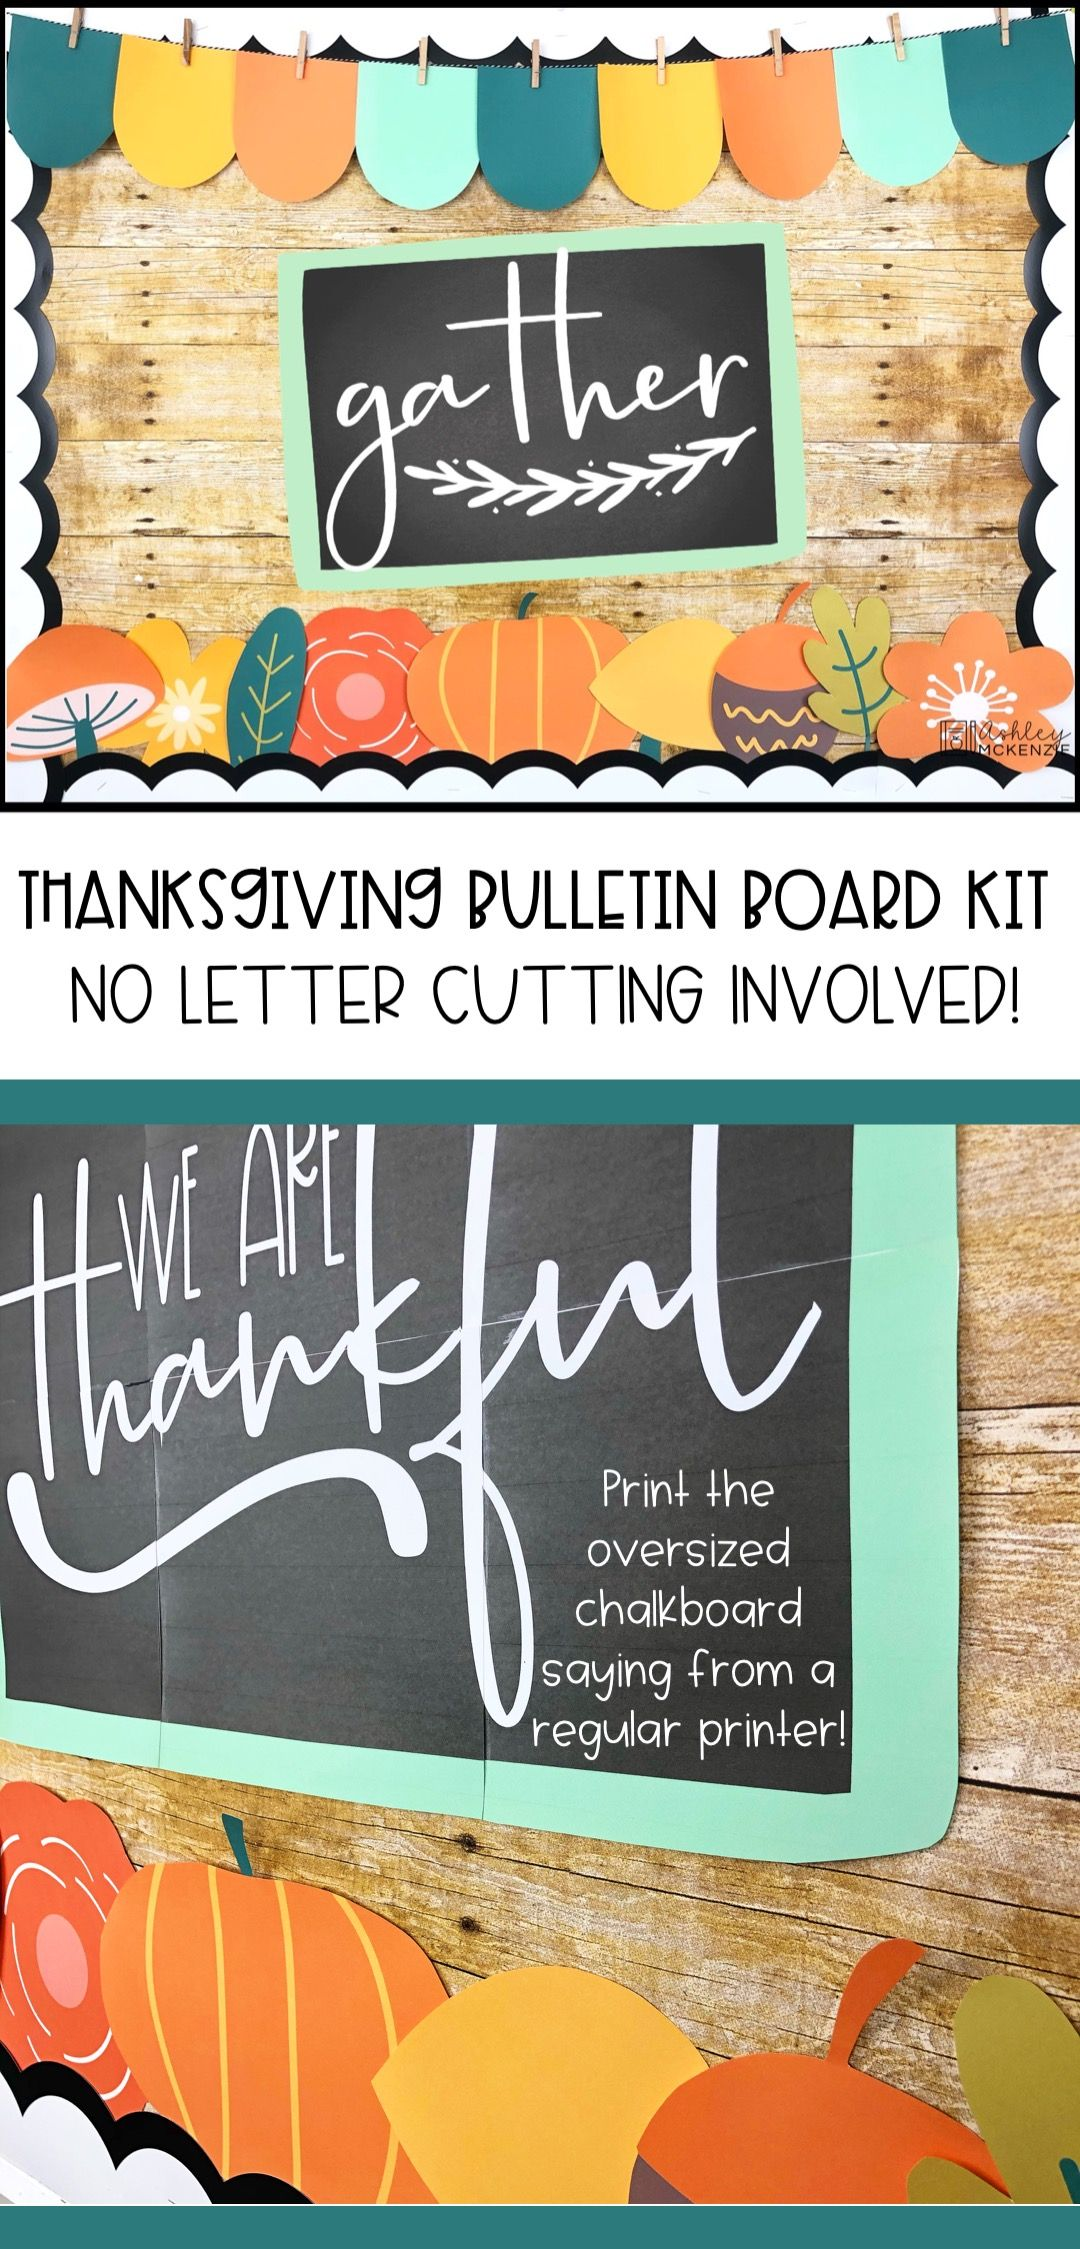 Thanksgiving Bulletin Board Kit